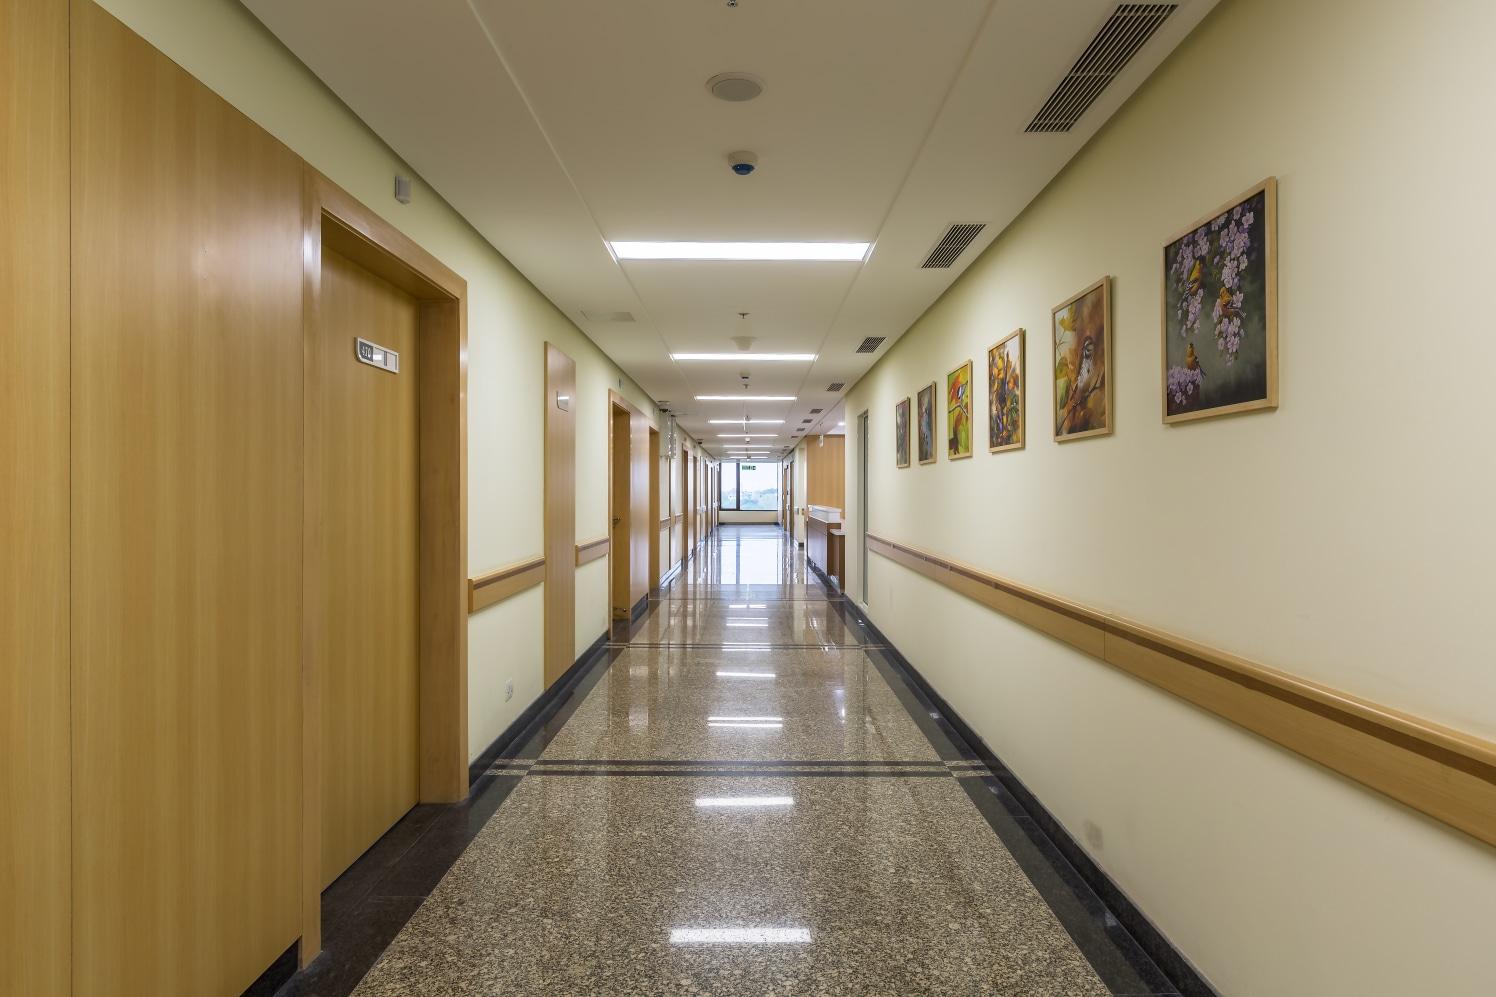 Hospital Hallway by Ravideep Singh Modern | Interior Design Photos & Ideas